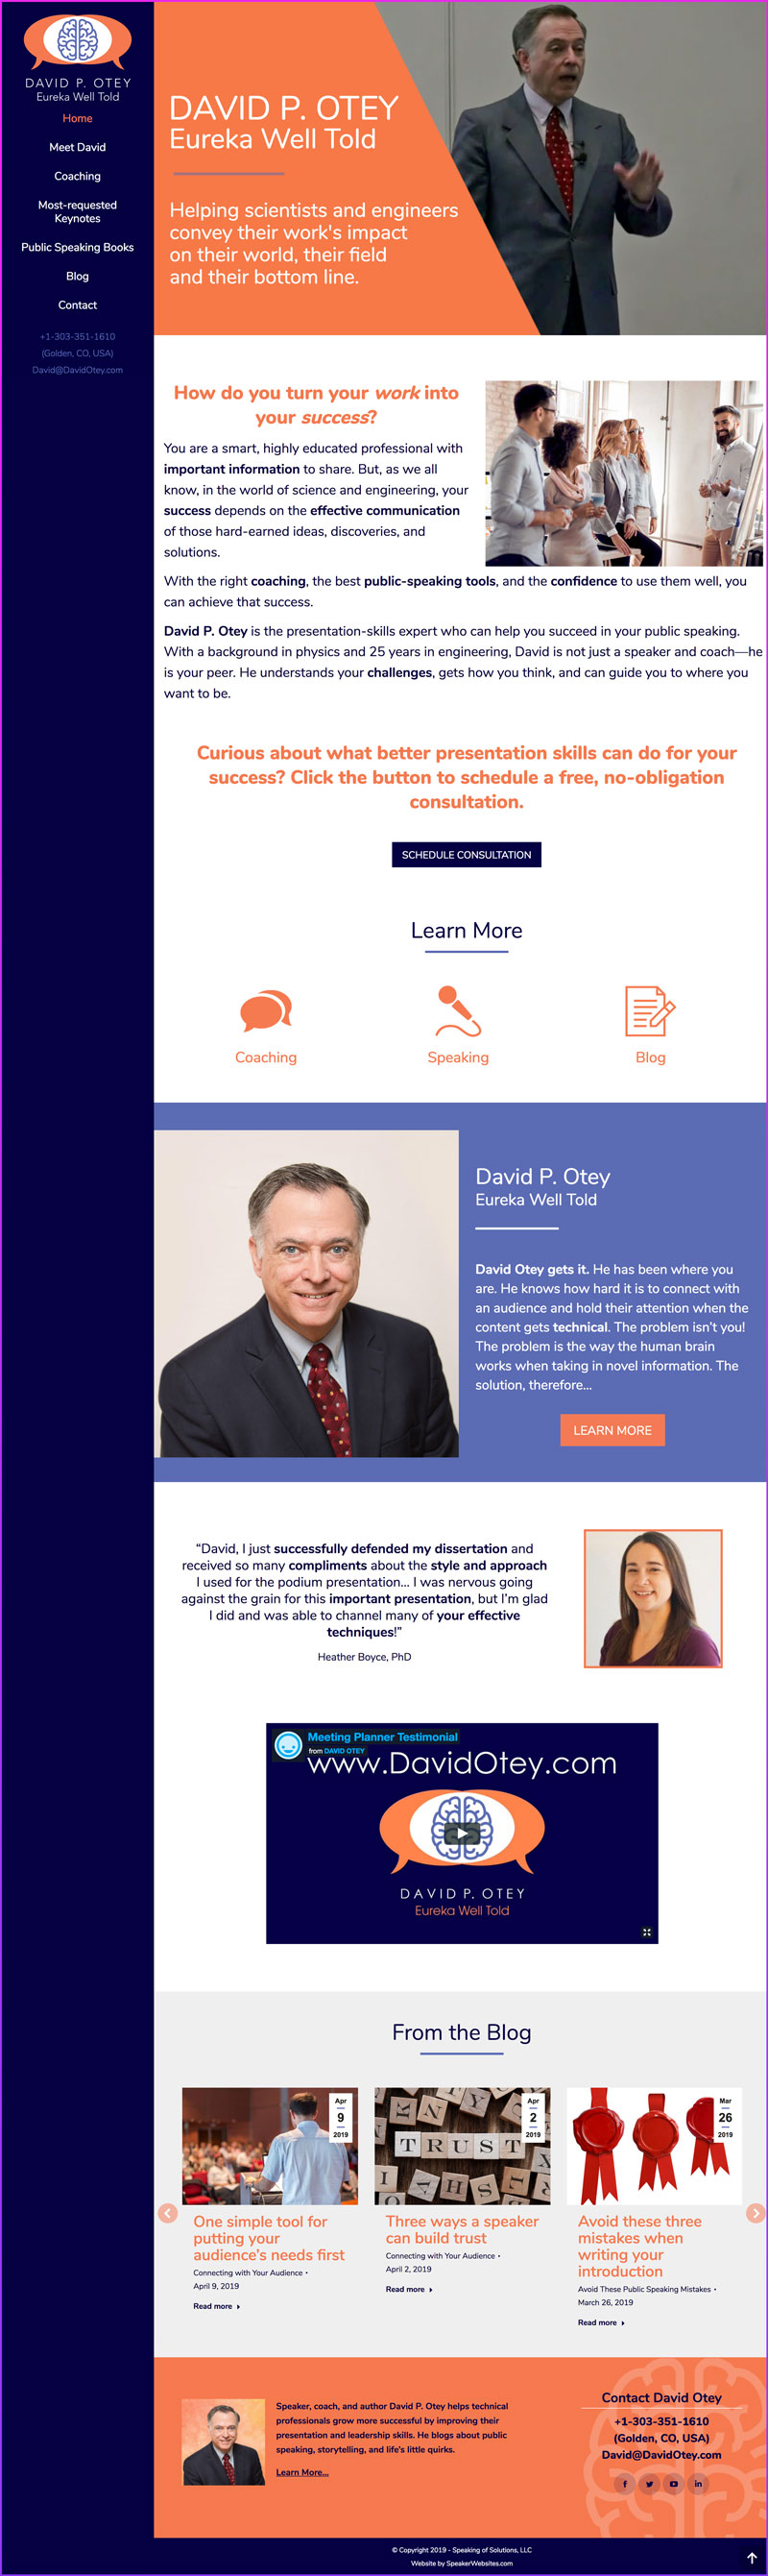 Technical Speaker & Speaking Coach, David P. Otey